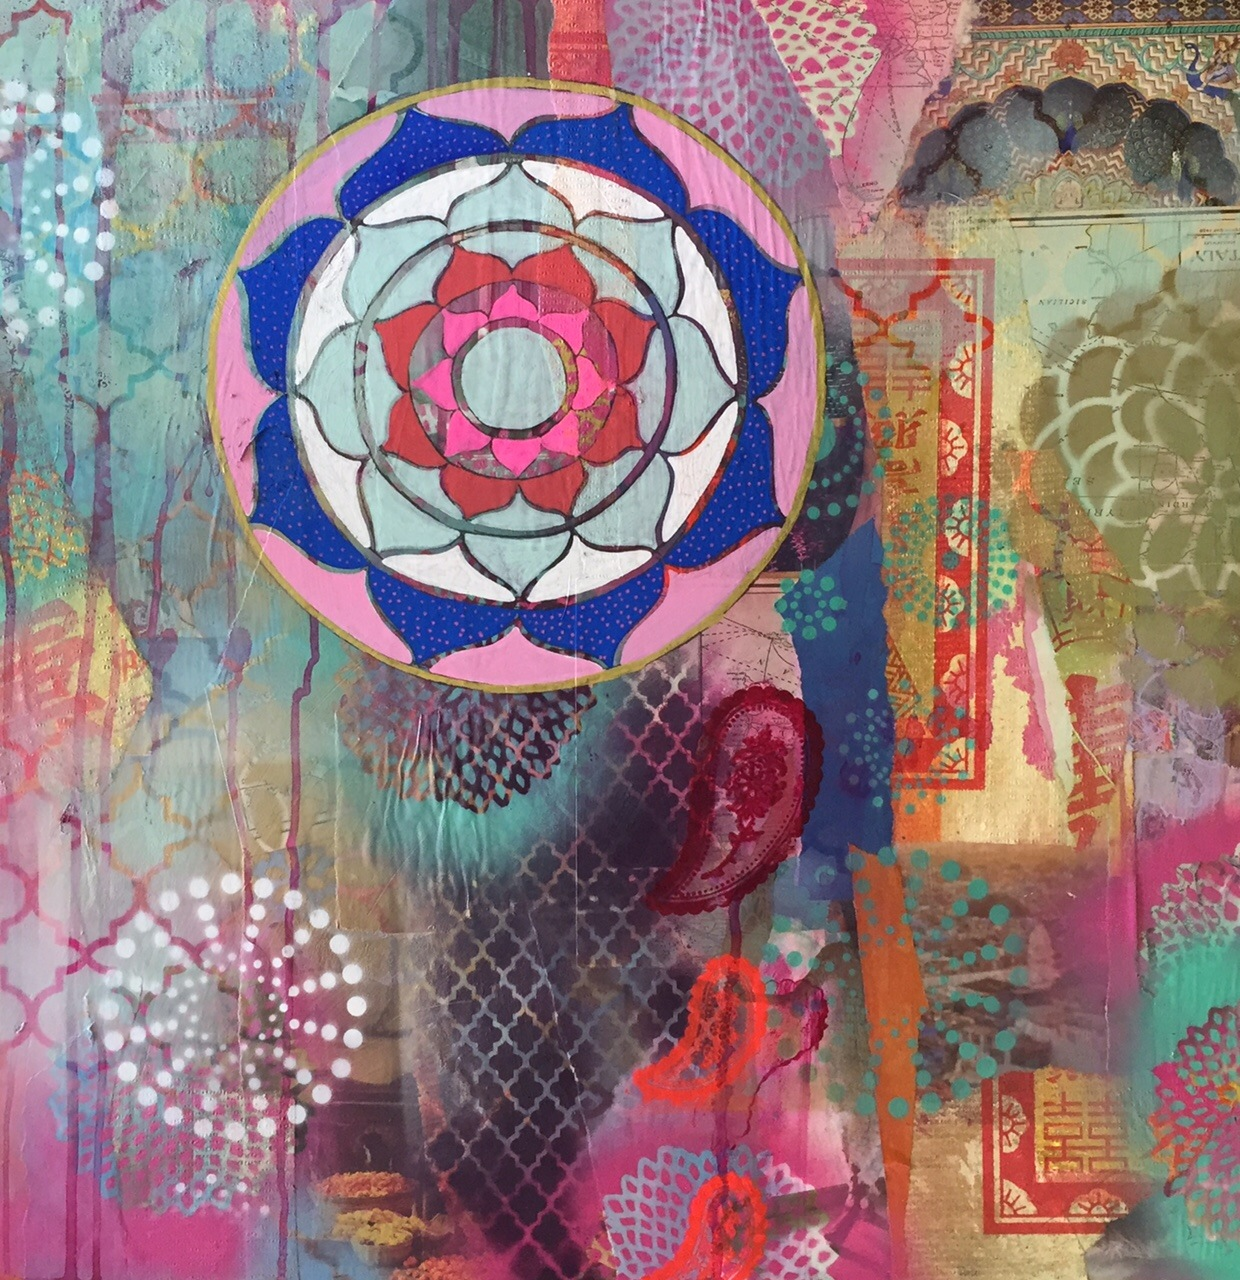 PHOTO 1 Layered Painted Mandalas.jpg